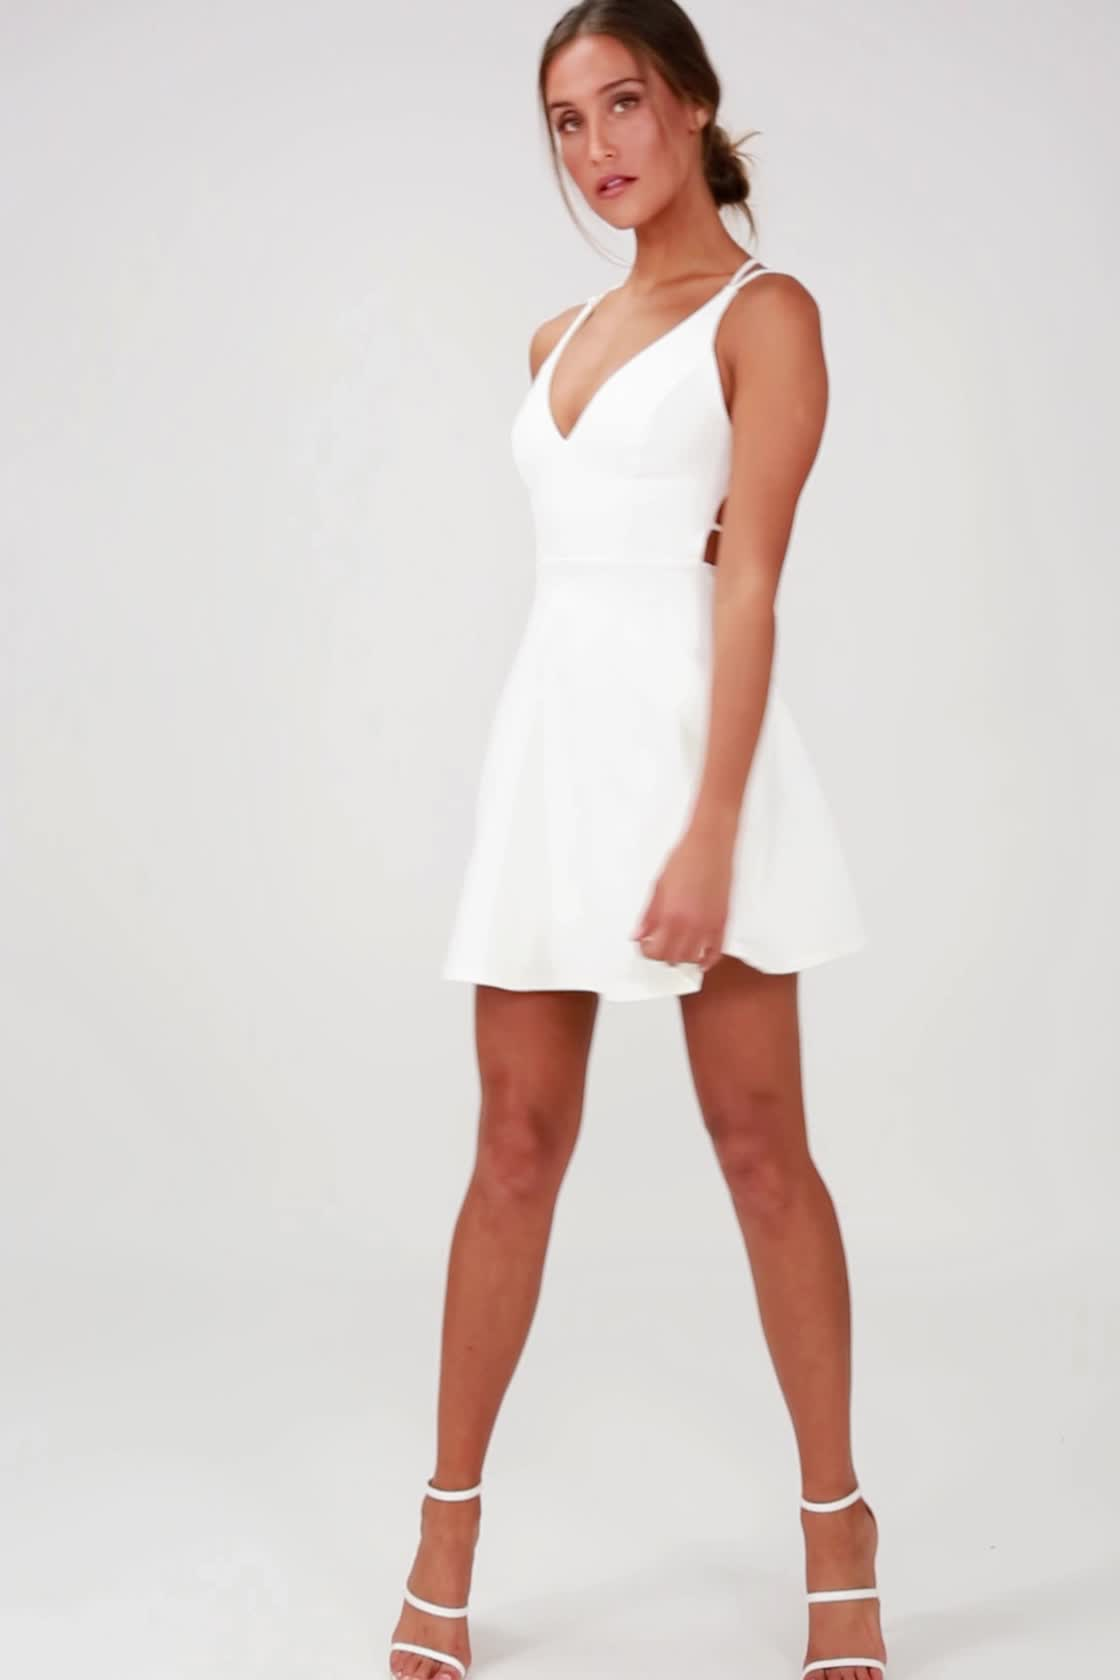 6e697e983e0fd0 Sexy White Dress - LWD - Backless Dress - Backless Skater Dress